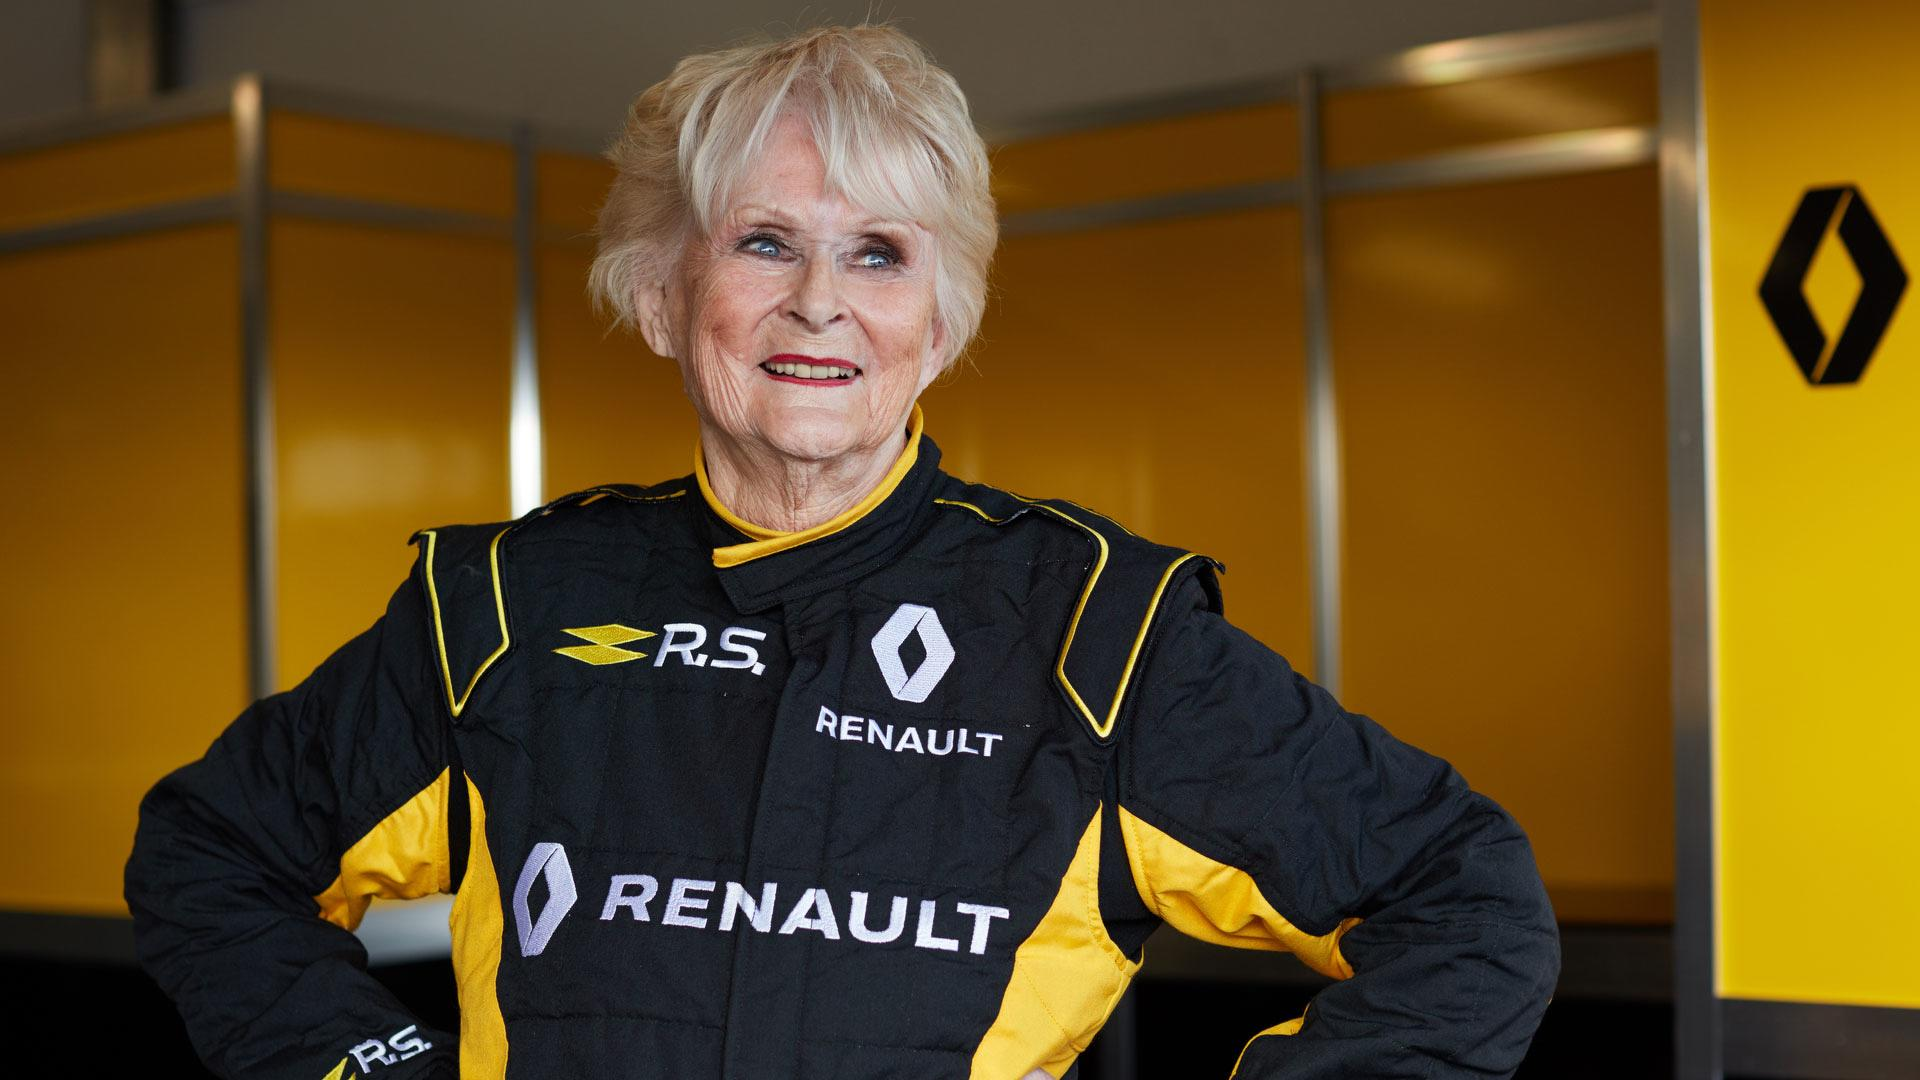 79-year-old-f1-driver (2).jpg